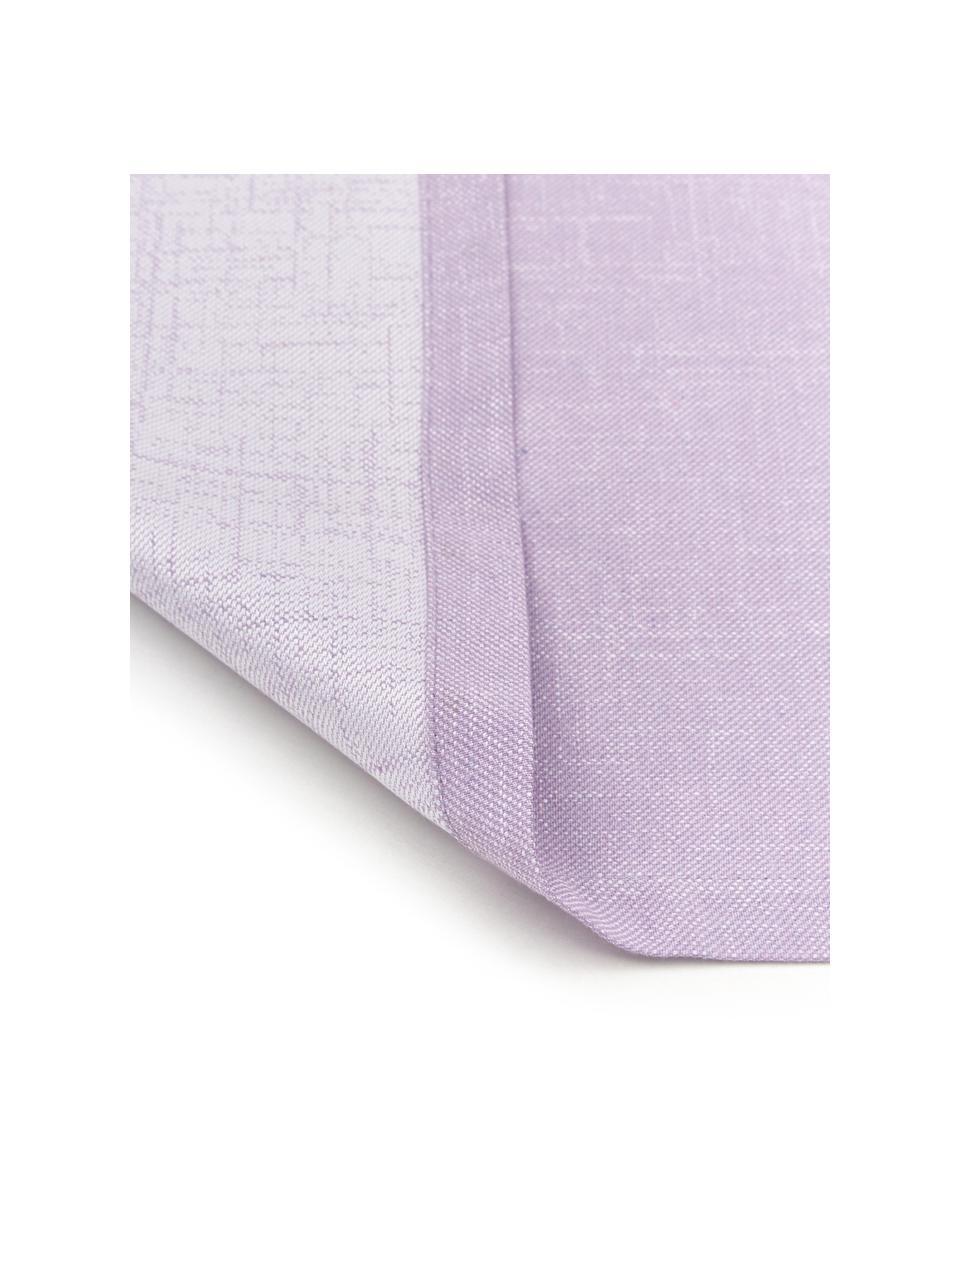 Tischläufer Riva in Lila, 55% Baumwolle, 45% Polyester, Lila, 40 x 145 cm